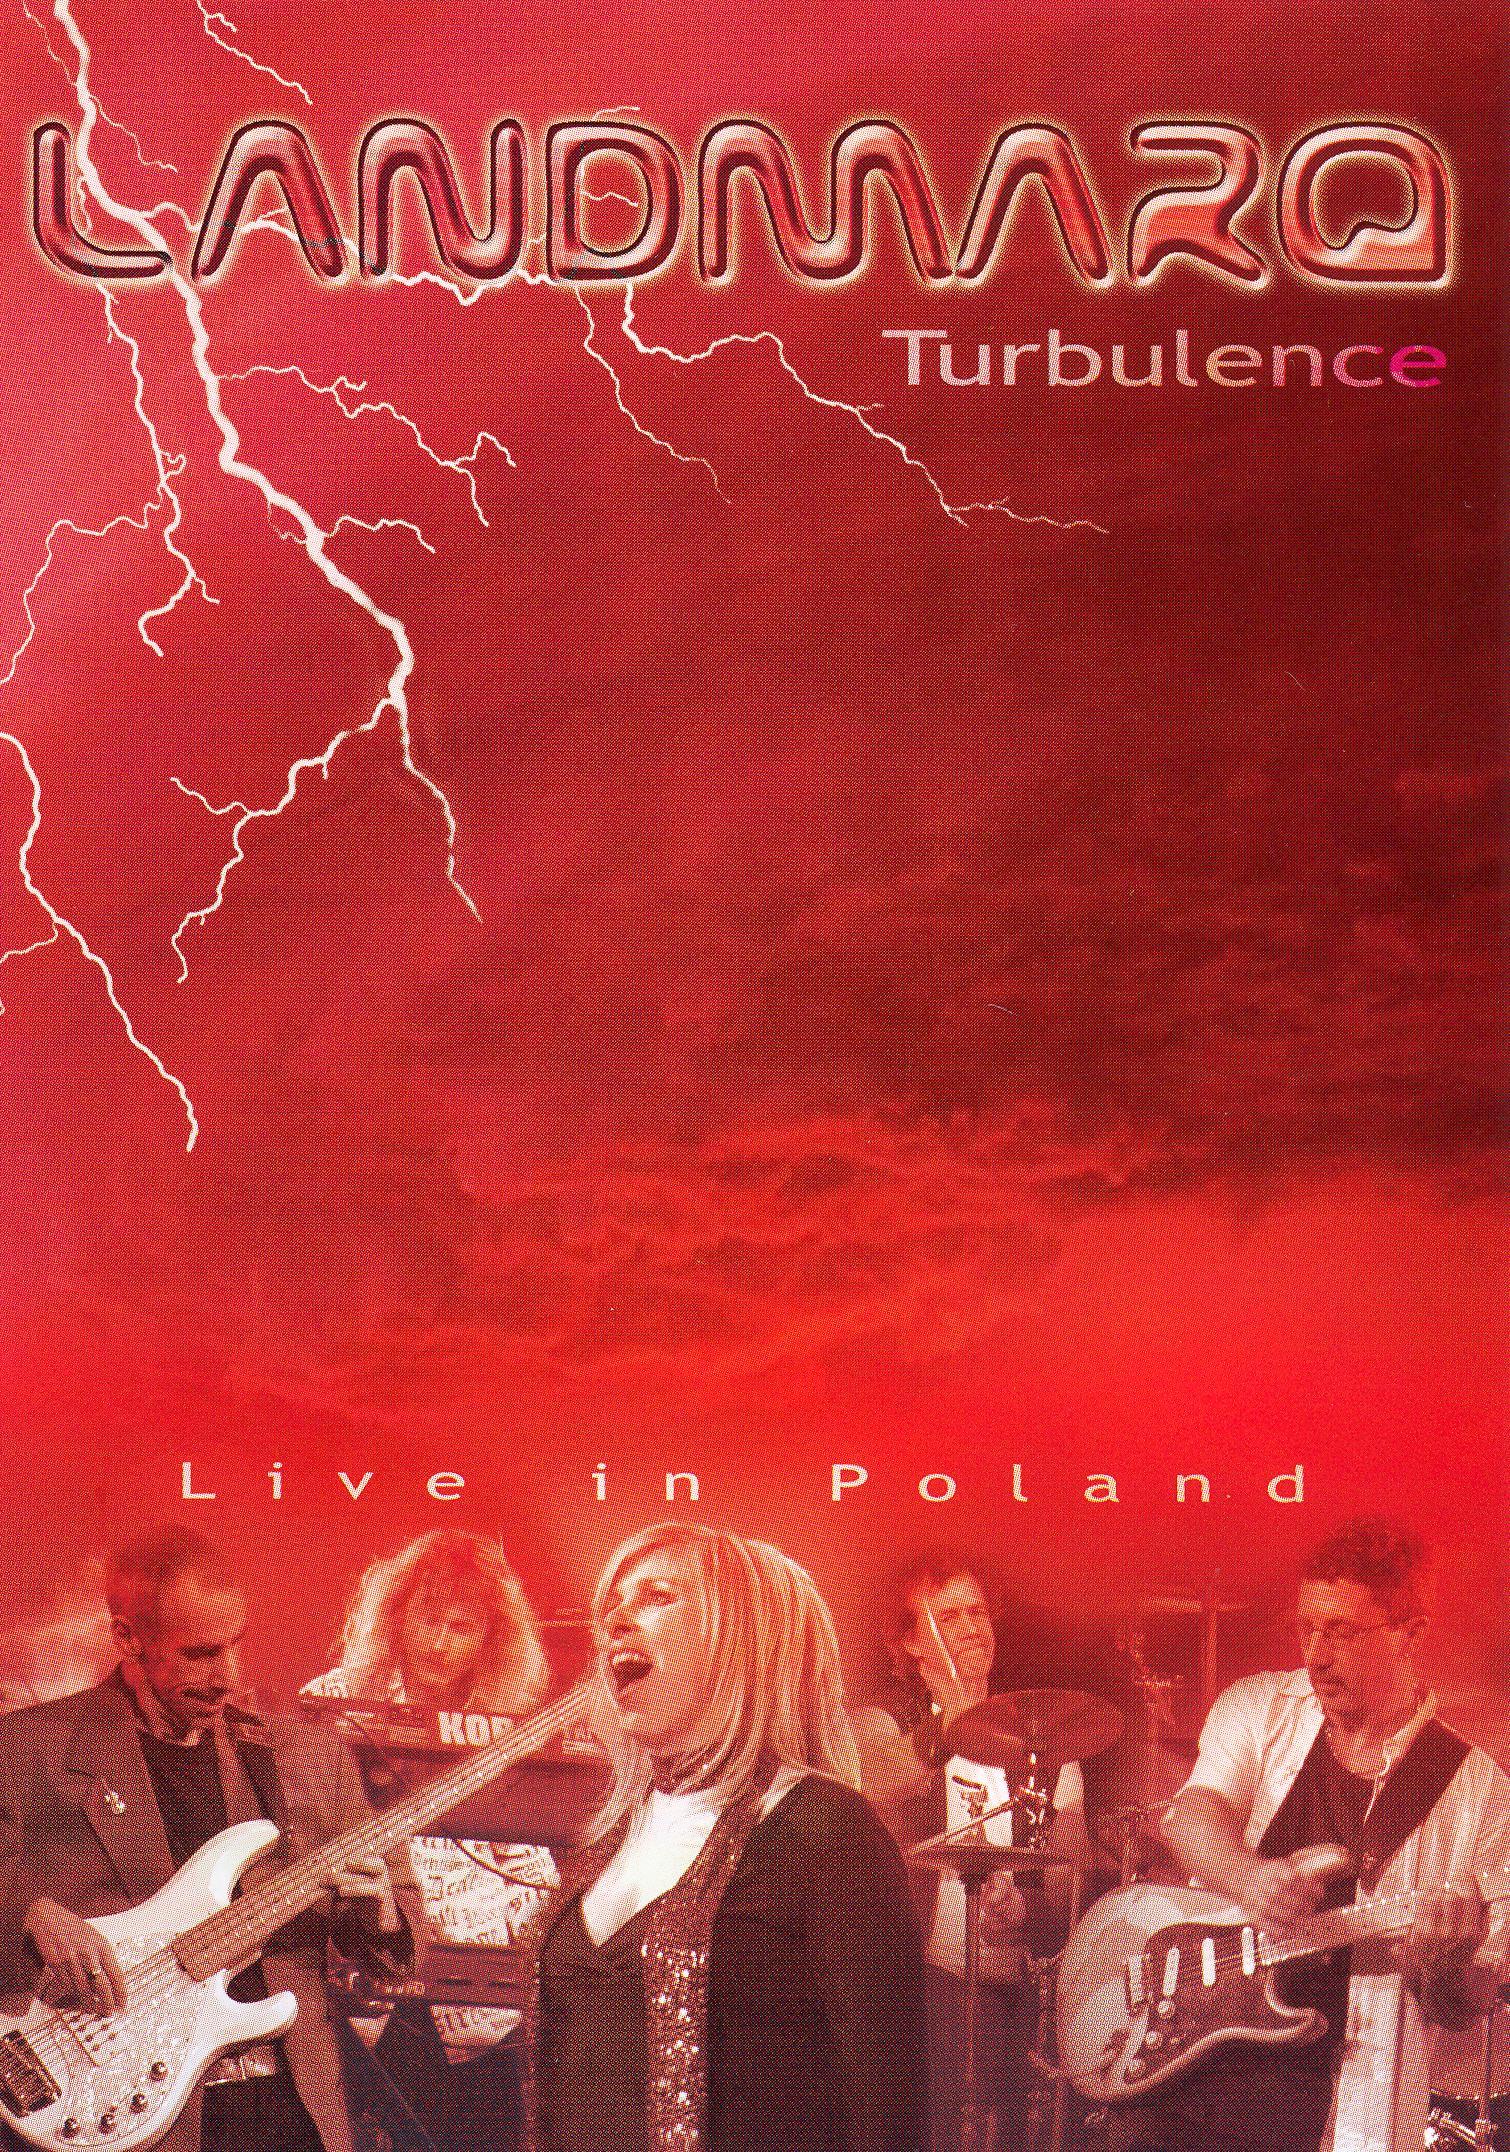 Landmarq: Turbulence - Live in Poland